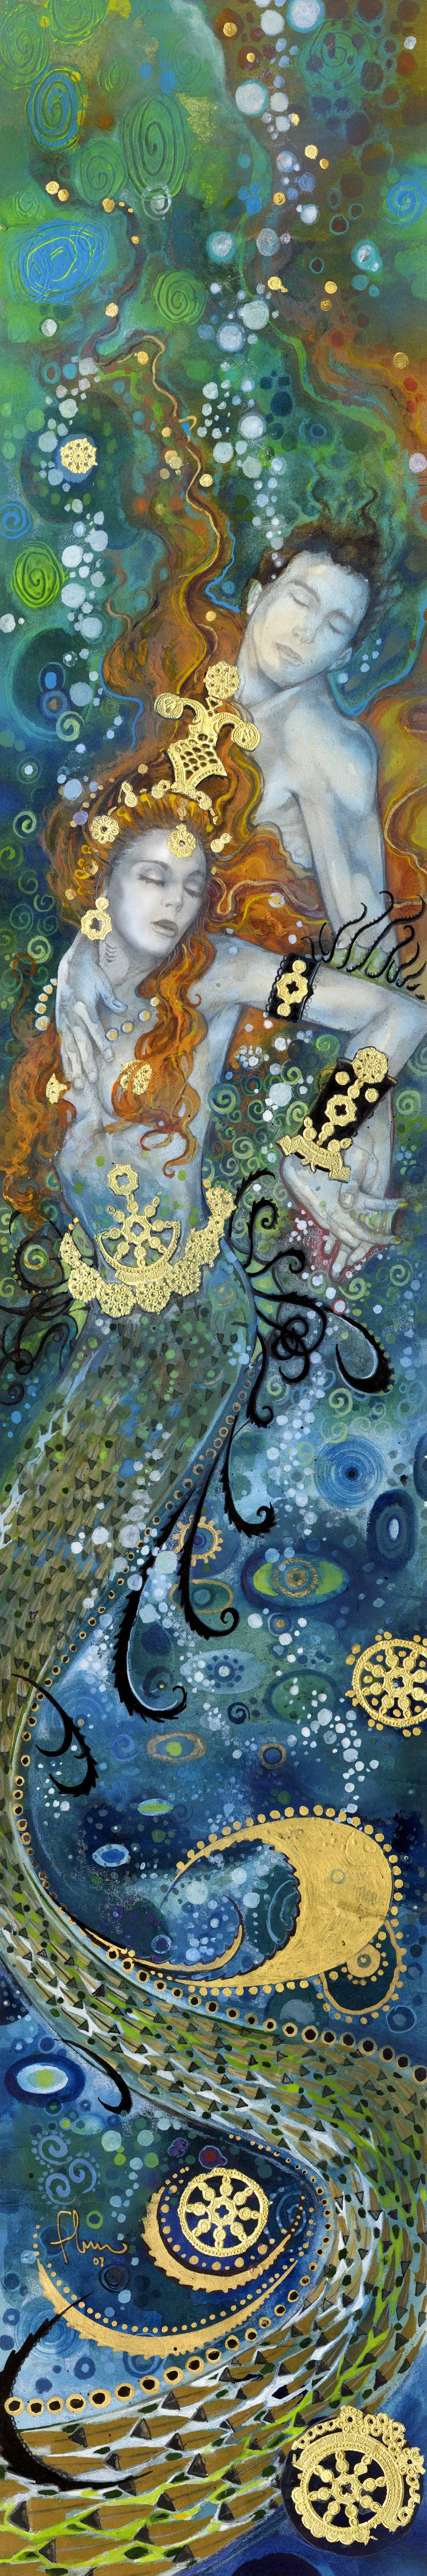 "Saatchi Art Artist Tom Fleming; Printmaking, ""Depths of Love"" #art"